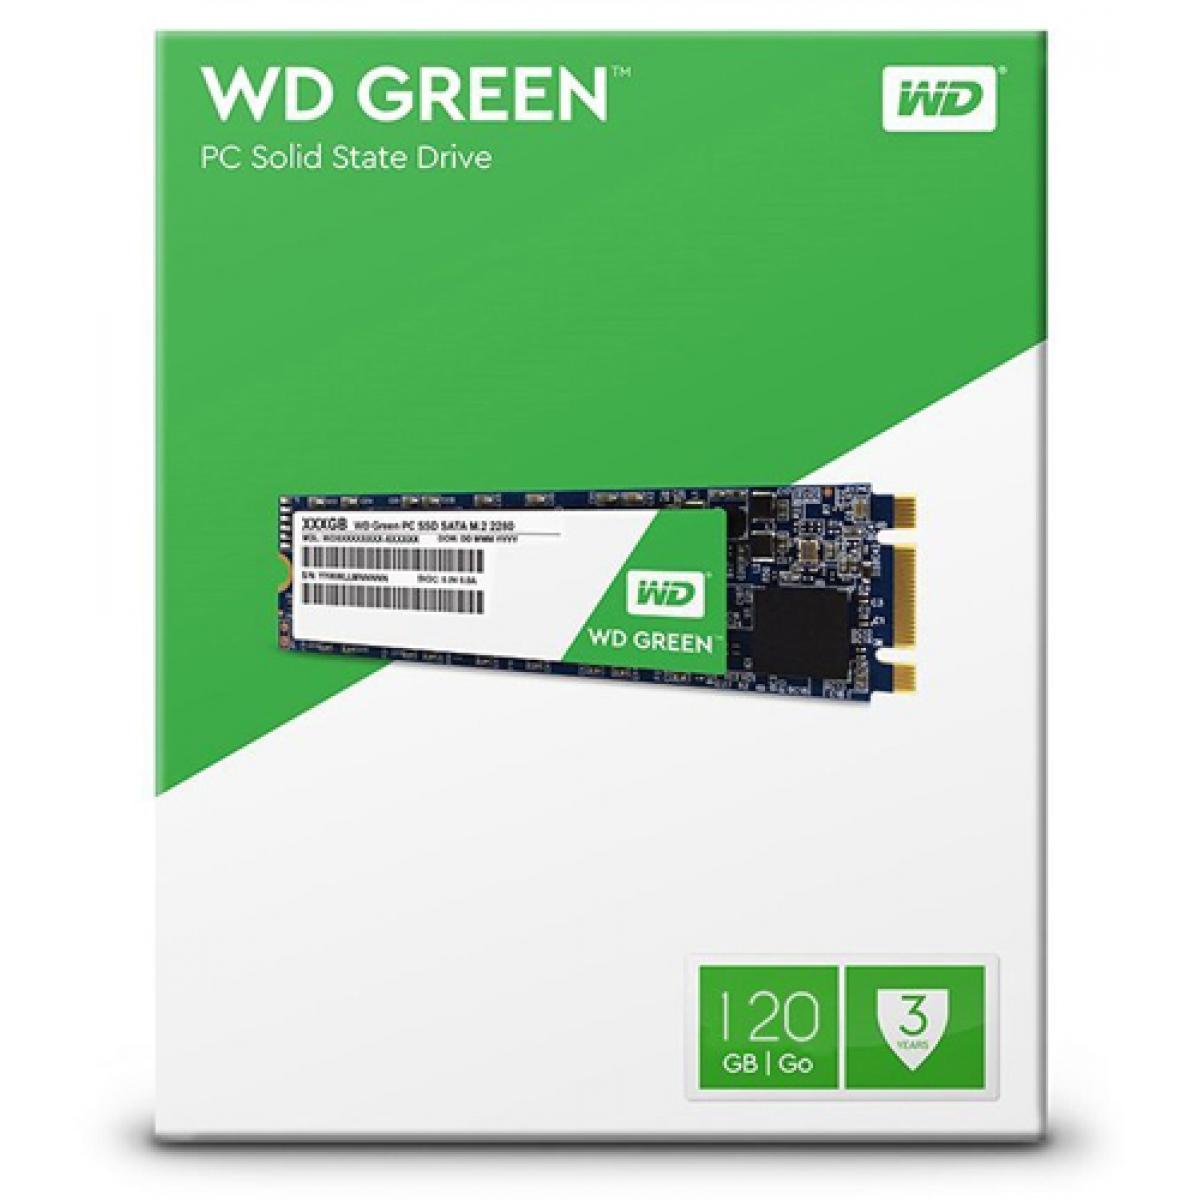 SSD WD Green, 120GB, M.2 2280, Leitura 540MBs e Gravação 430MBs, WDS120G2G0B